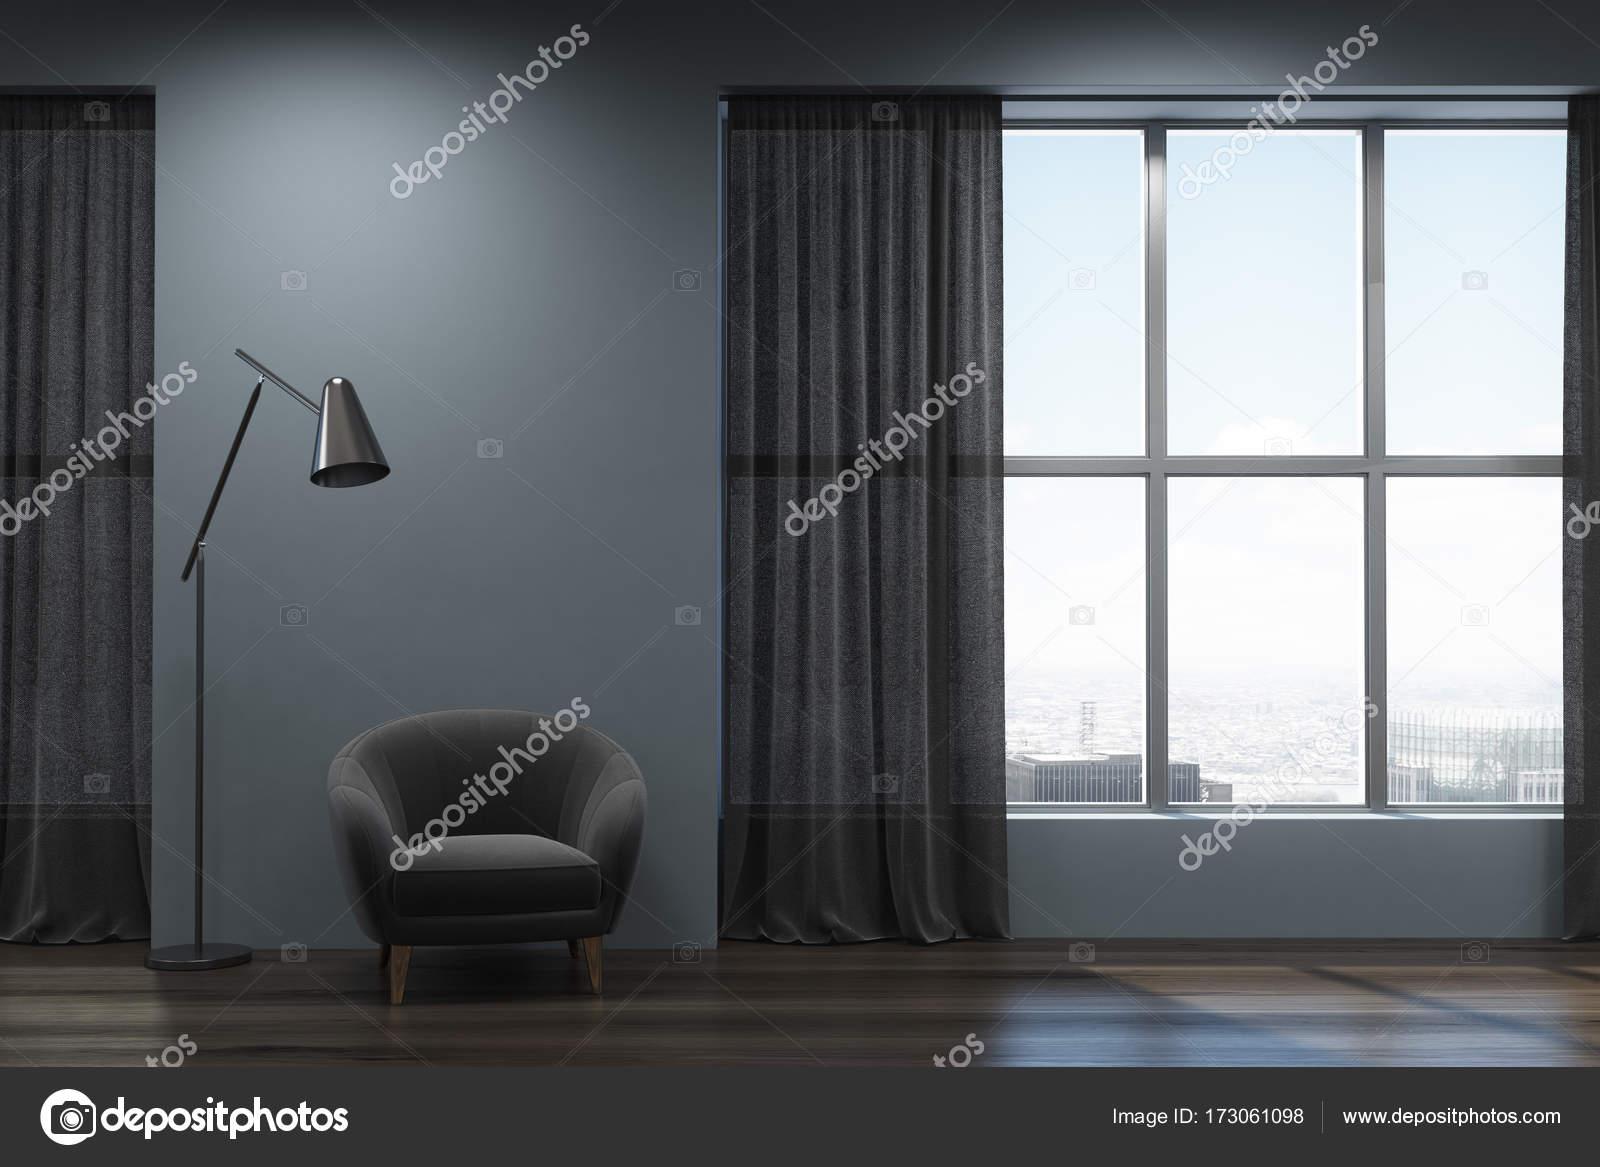 Wohnzimmer Schwarz Grau, schwarz grau wohnzimmer sessel — stockfoto © denisismagilov #173061098, Design ideen